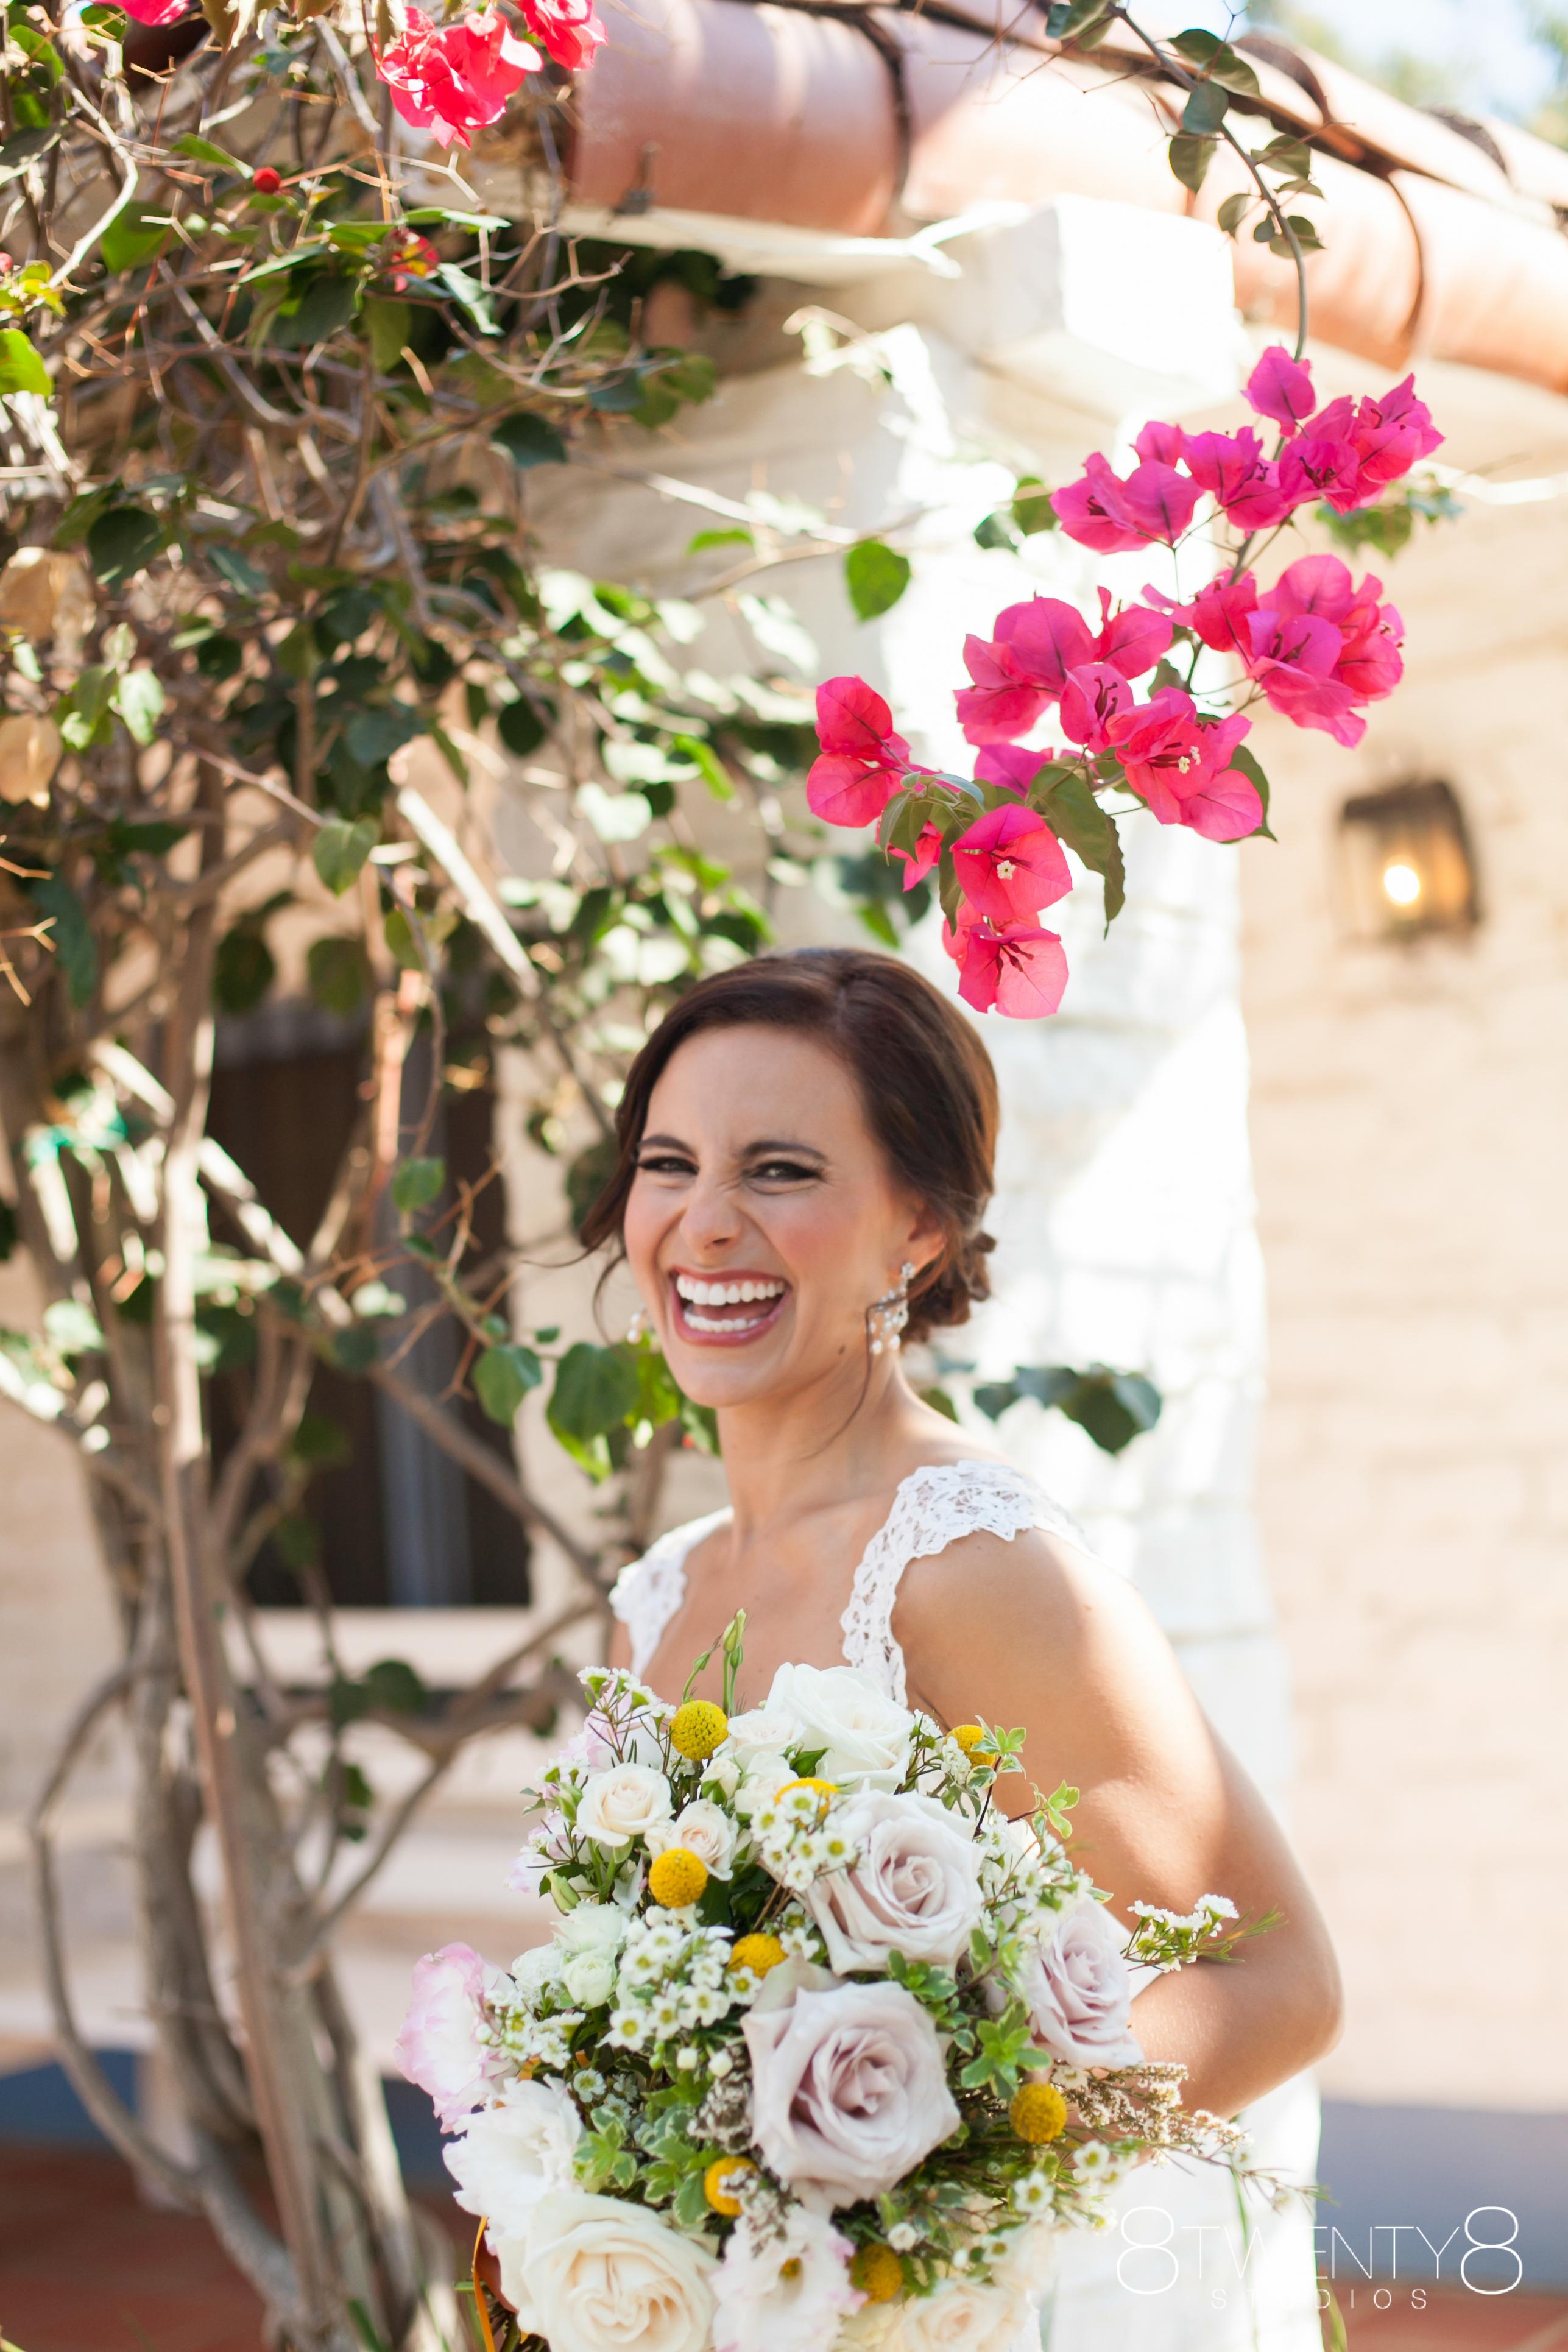 0112-130914-brianne-josh-wedding--¬8twenty8-Studios - Copy